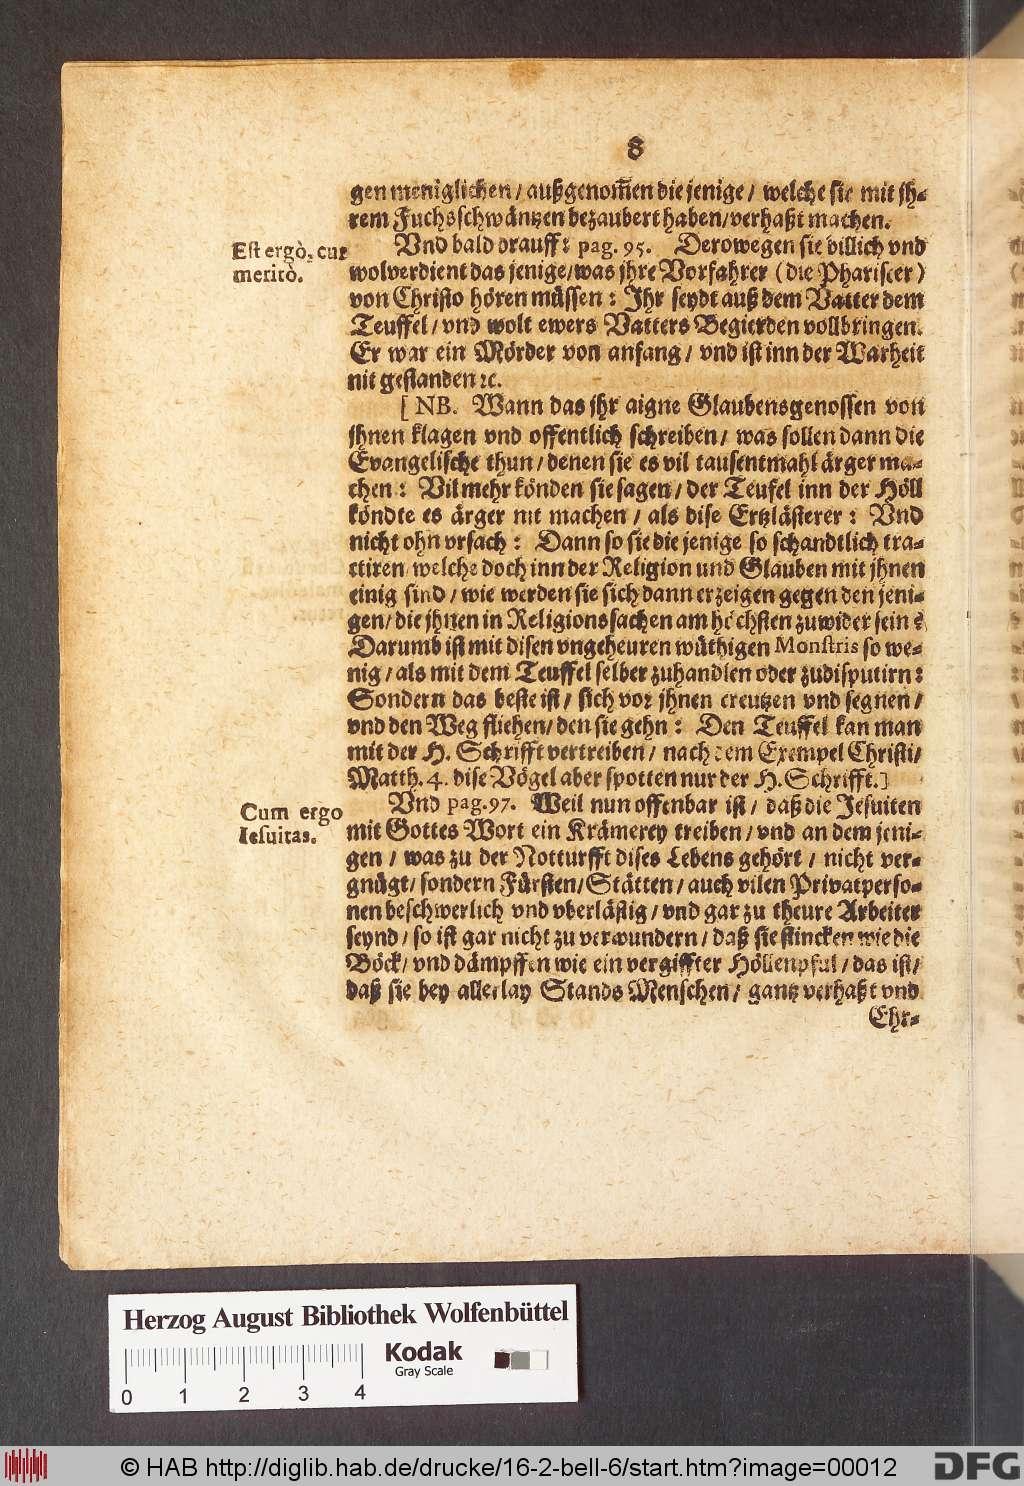 http://diglib.hab.de/drucke/16-2-bell-6/00012.jpg